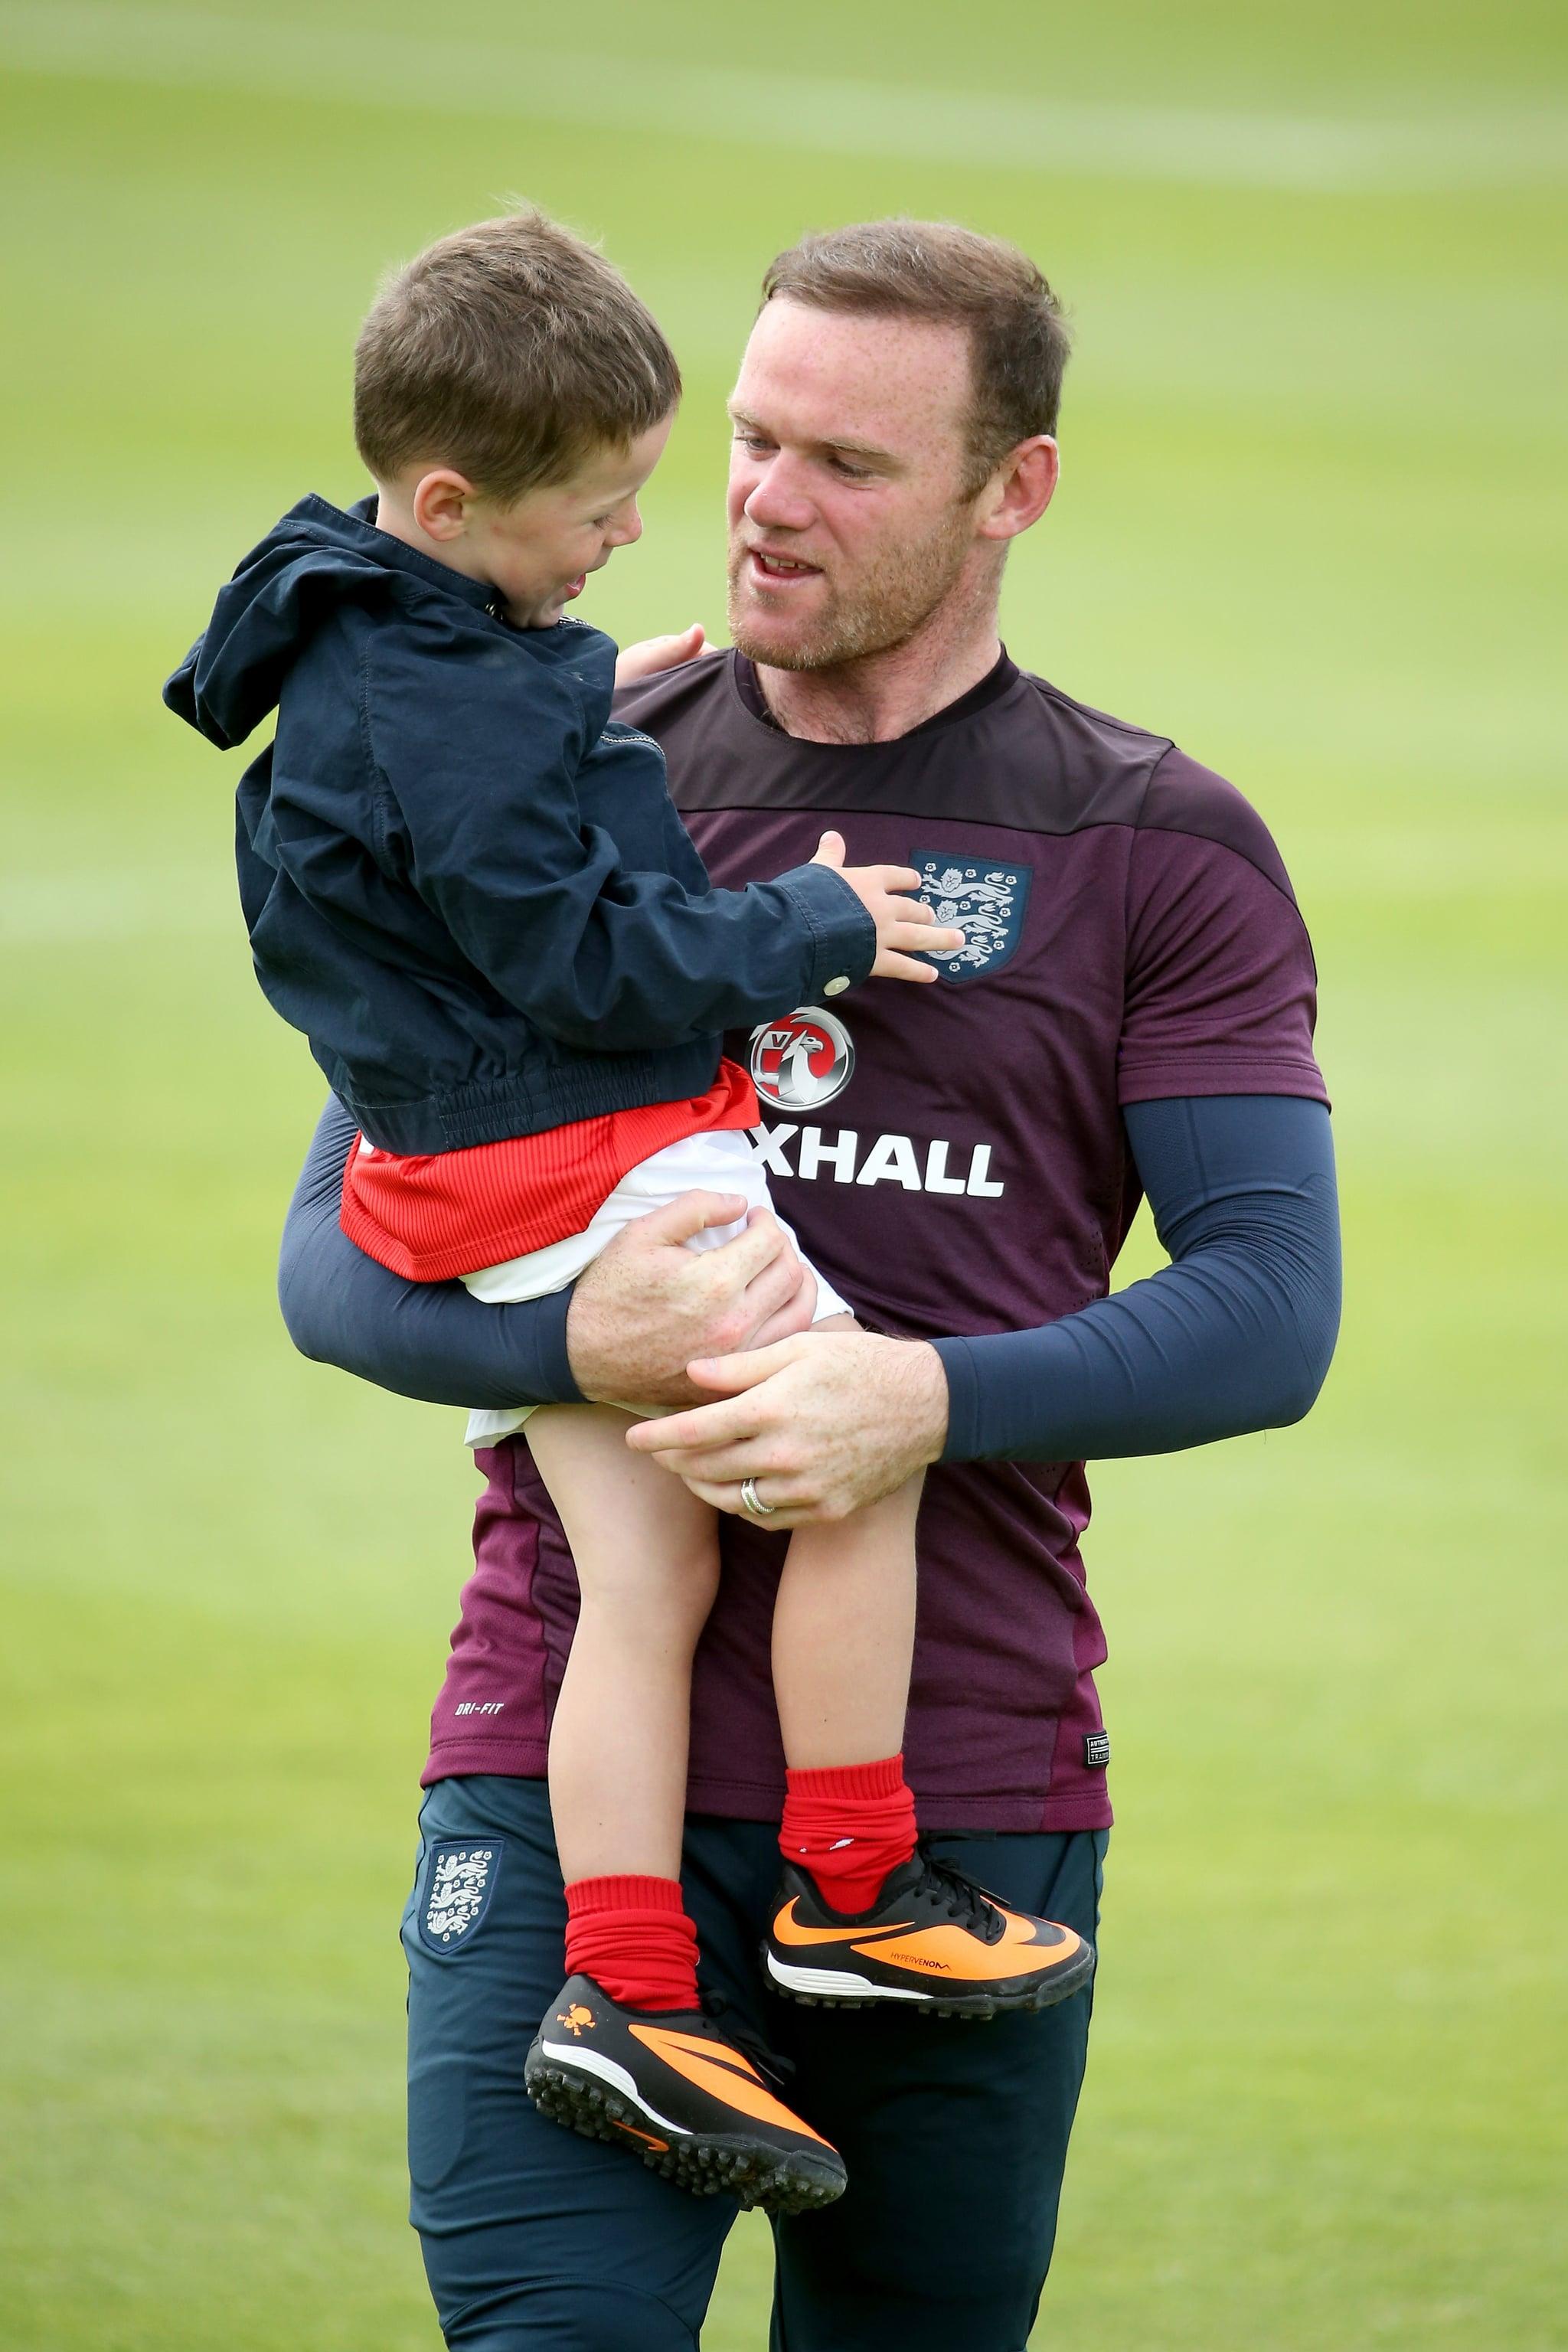 Wayne Rooney —England